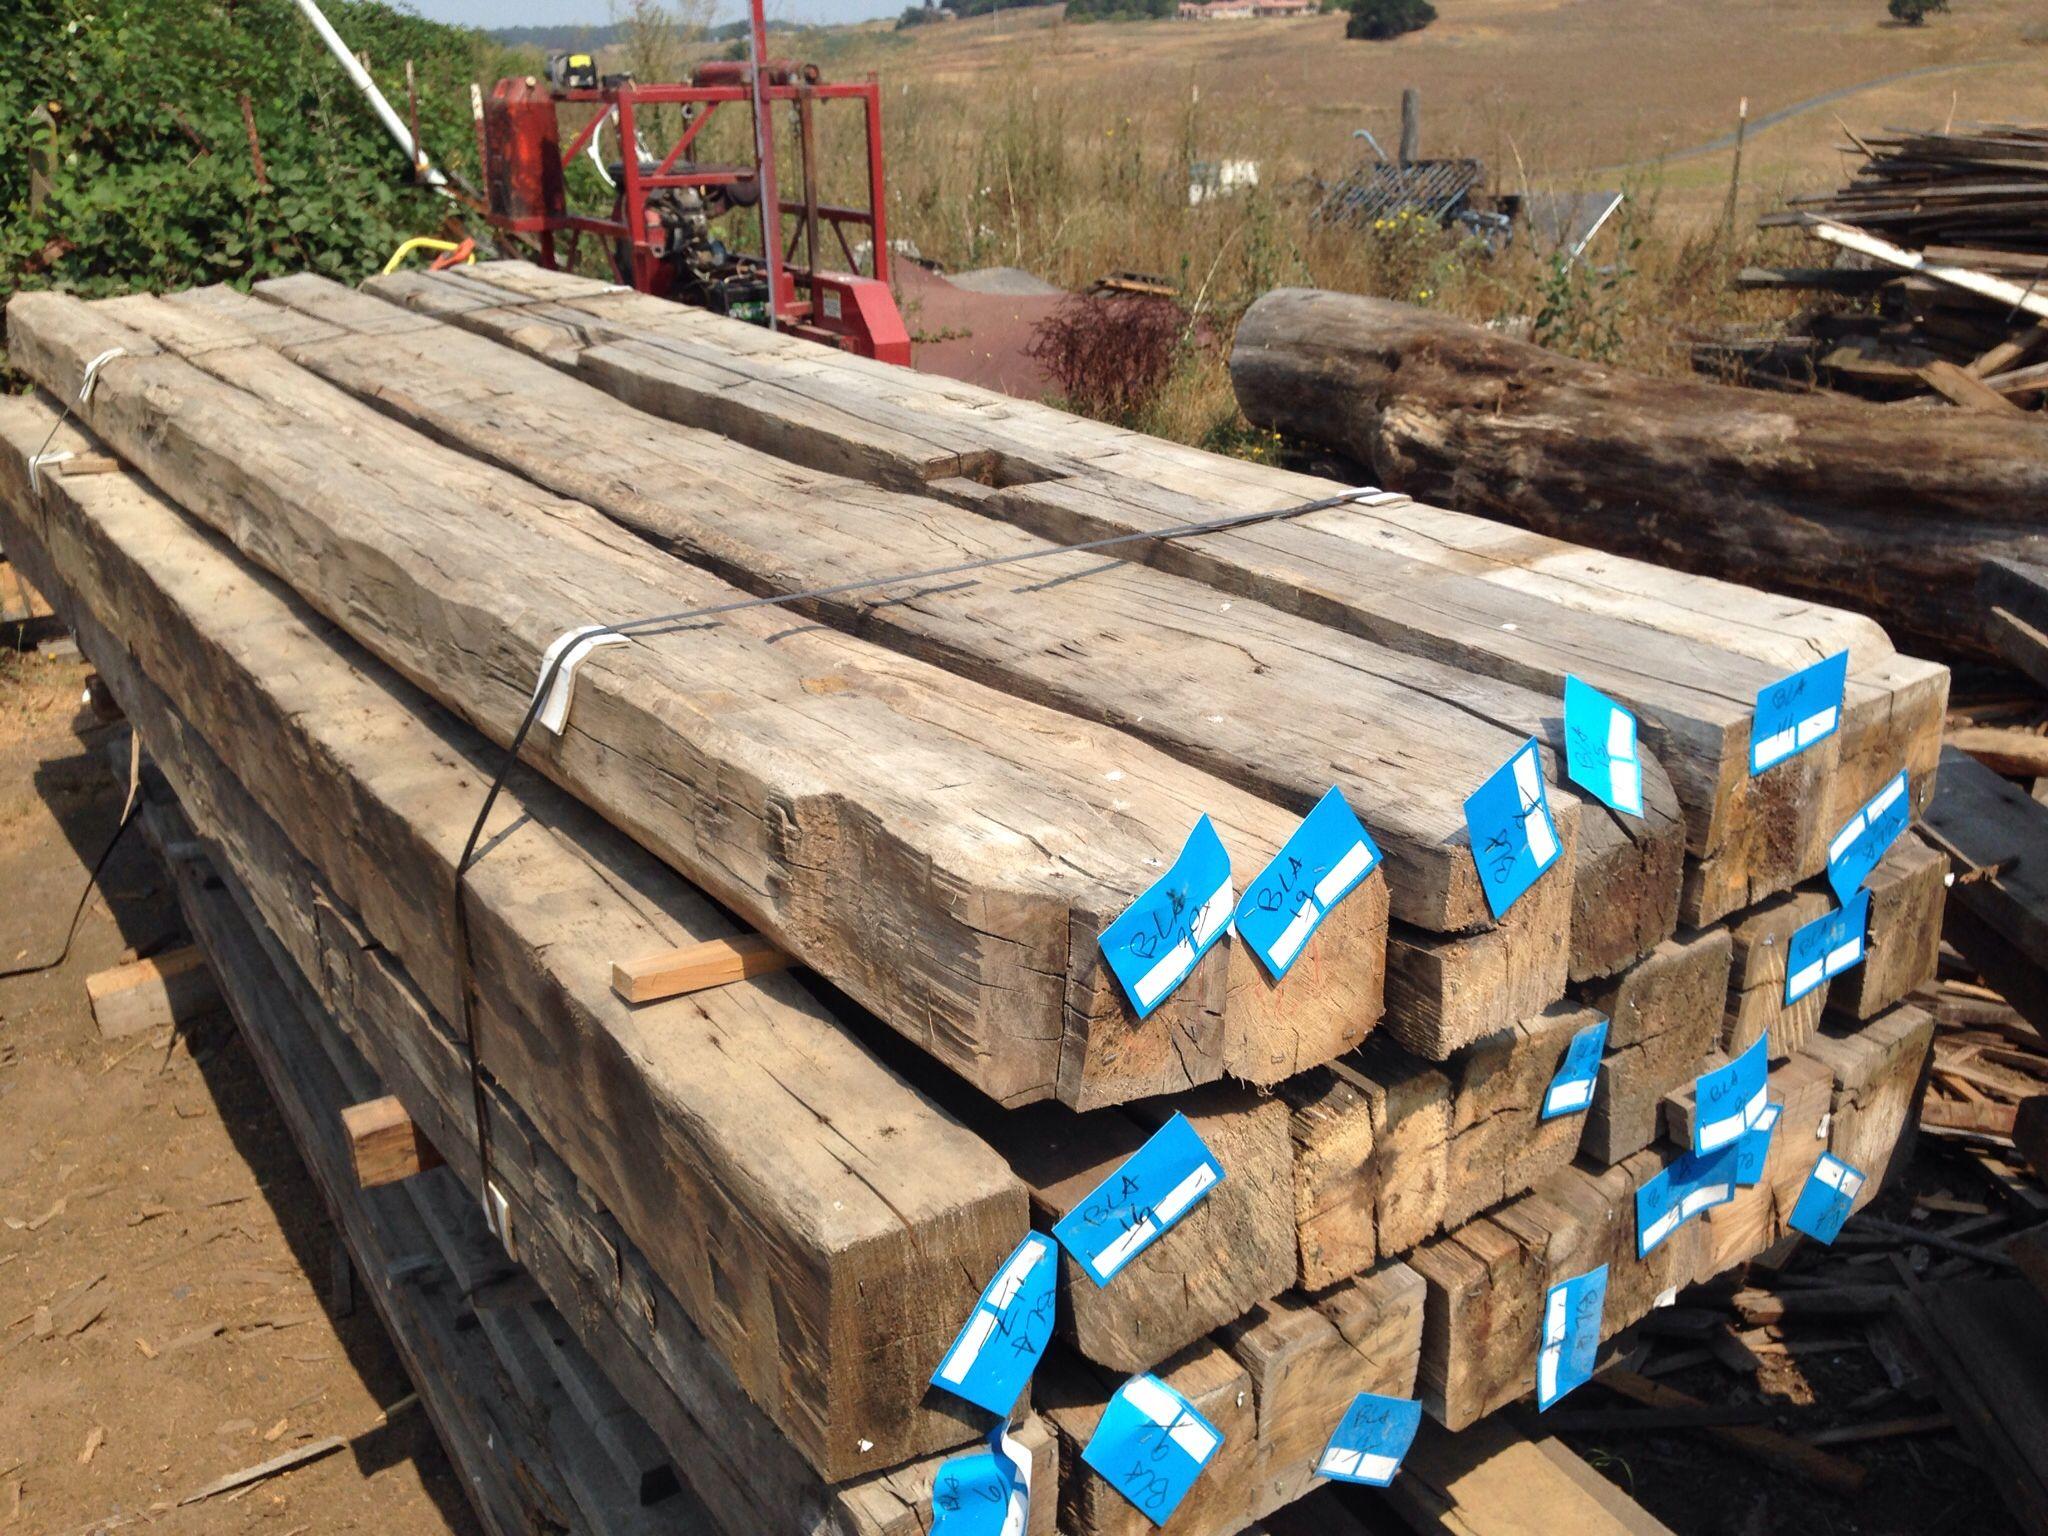 Reclaimed Wood Beams Originally Hand Hewn 6x6 Dimension Reclaimed Wood Beams Wood Reclaimed Wood